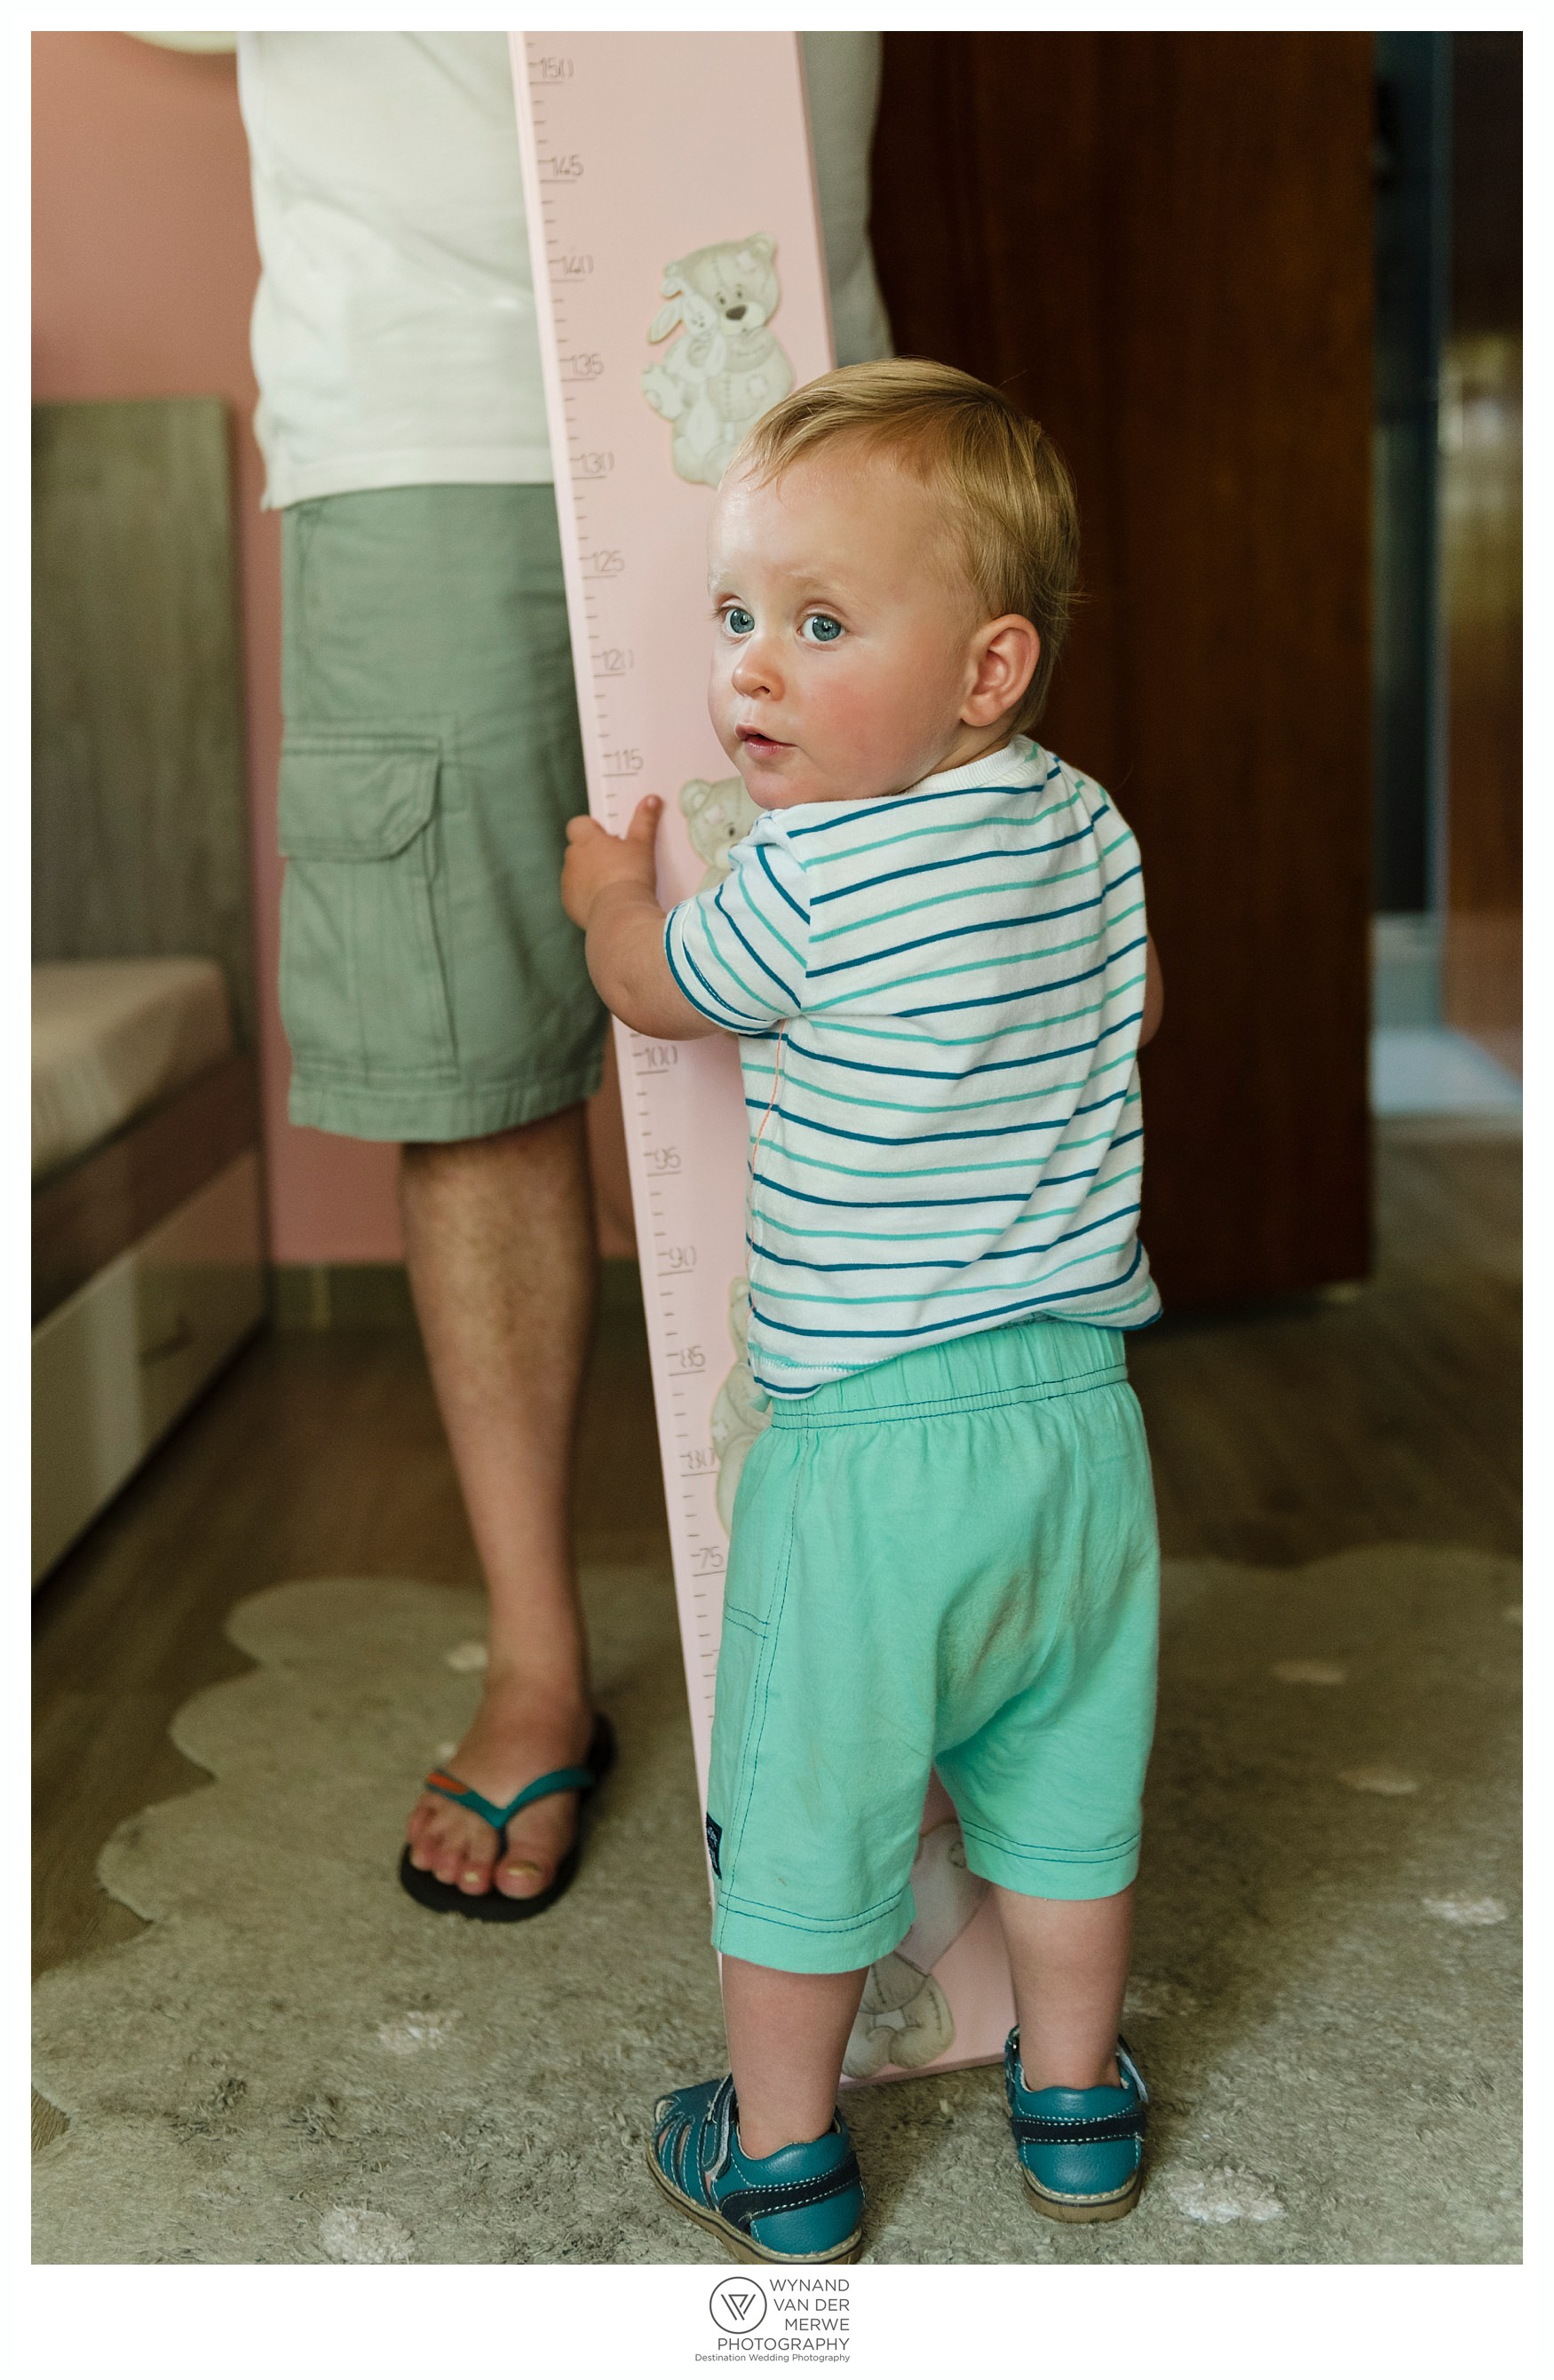 Wynandvandermerwe kirsten robert family lifestyle photography benoni location gauteng-81.jpg